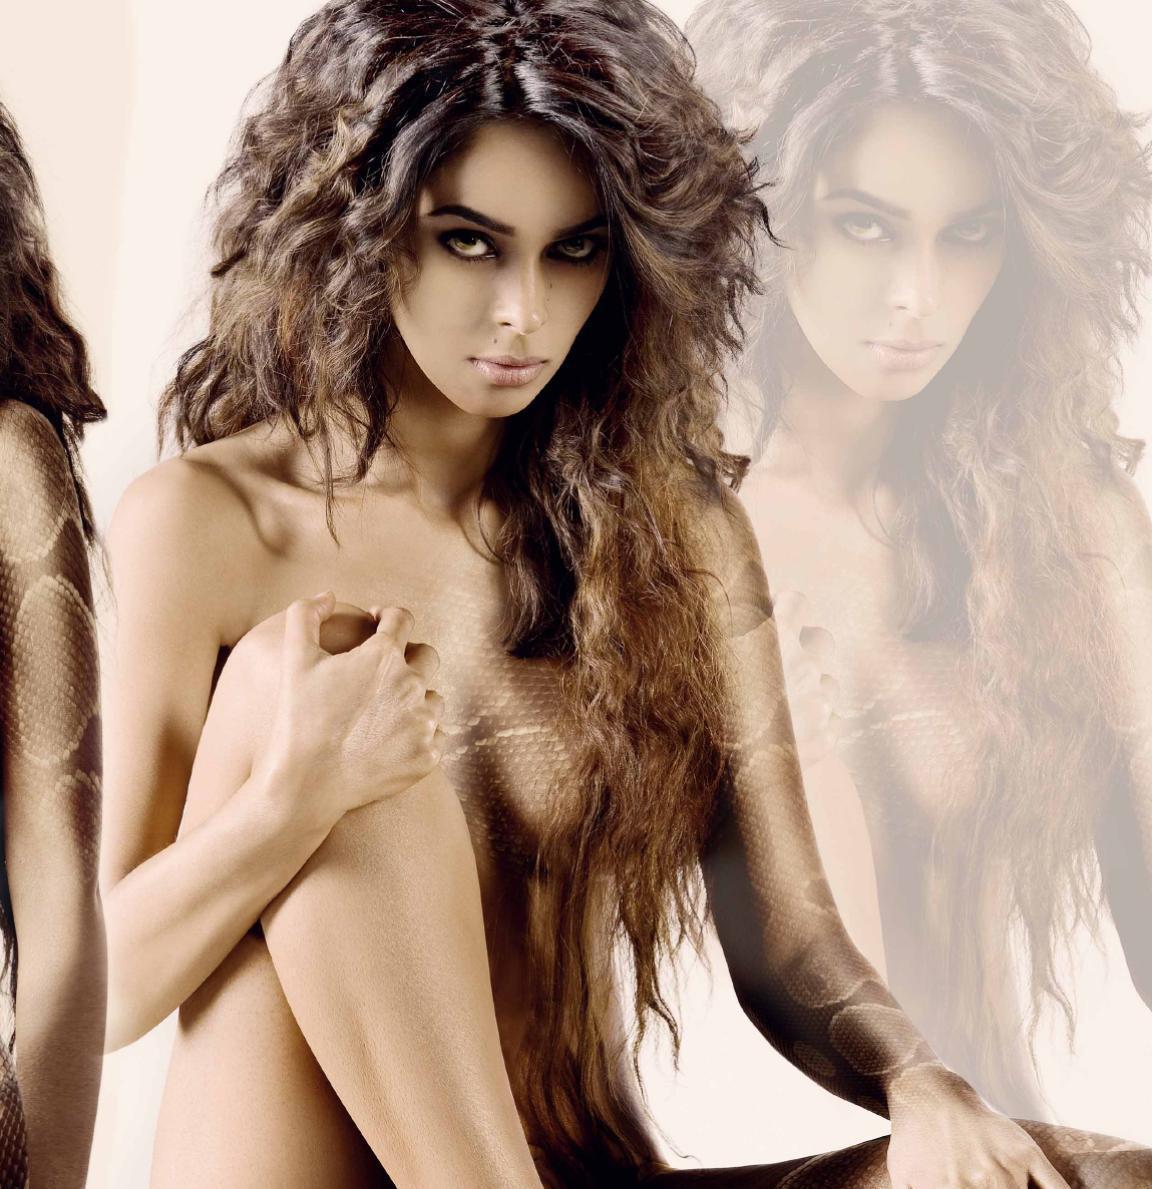 Download Song Lock Up By Karan: Mallika Sherawat Topless New Hot Photoshoot Unseen